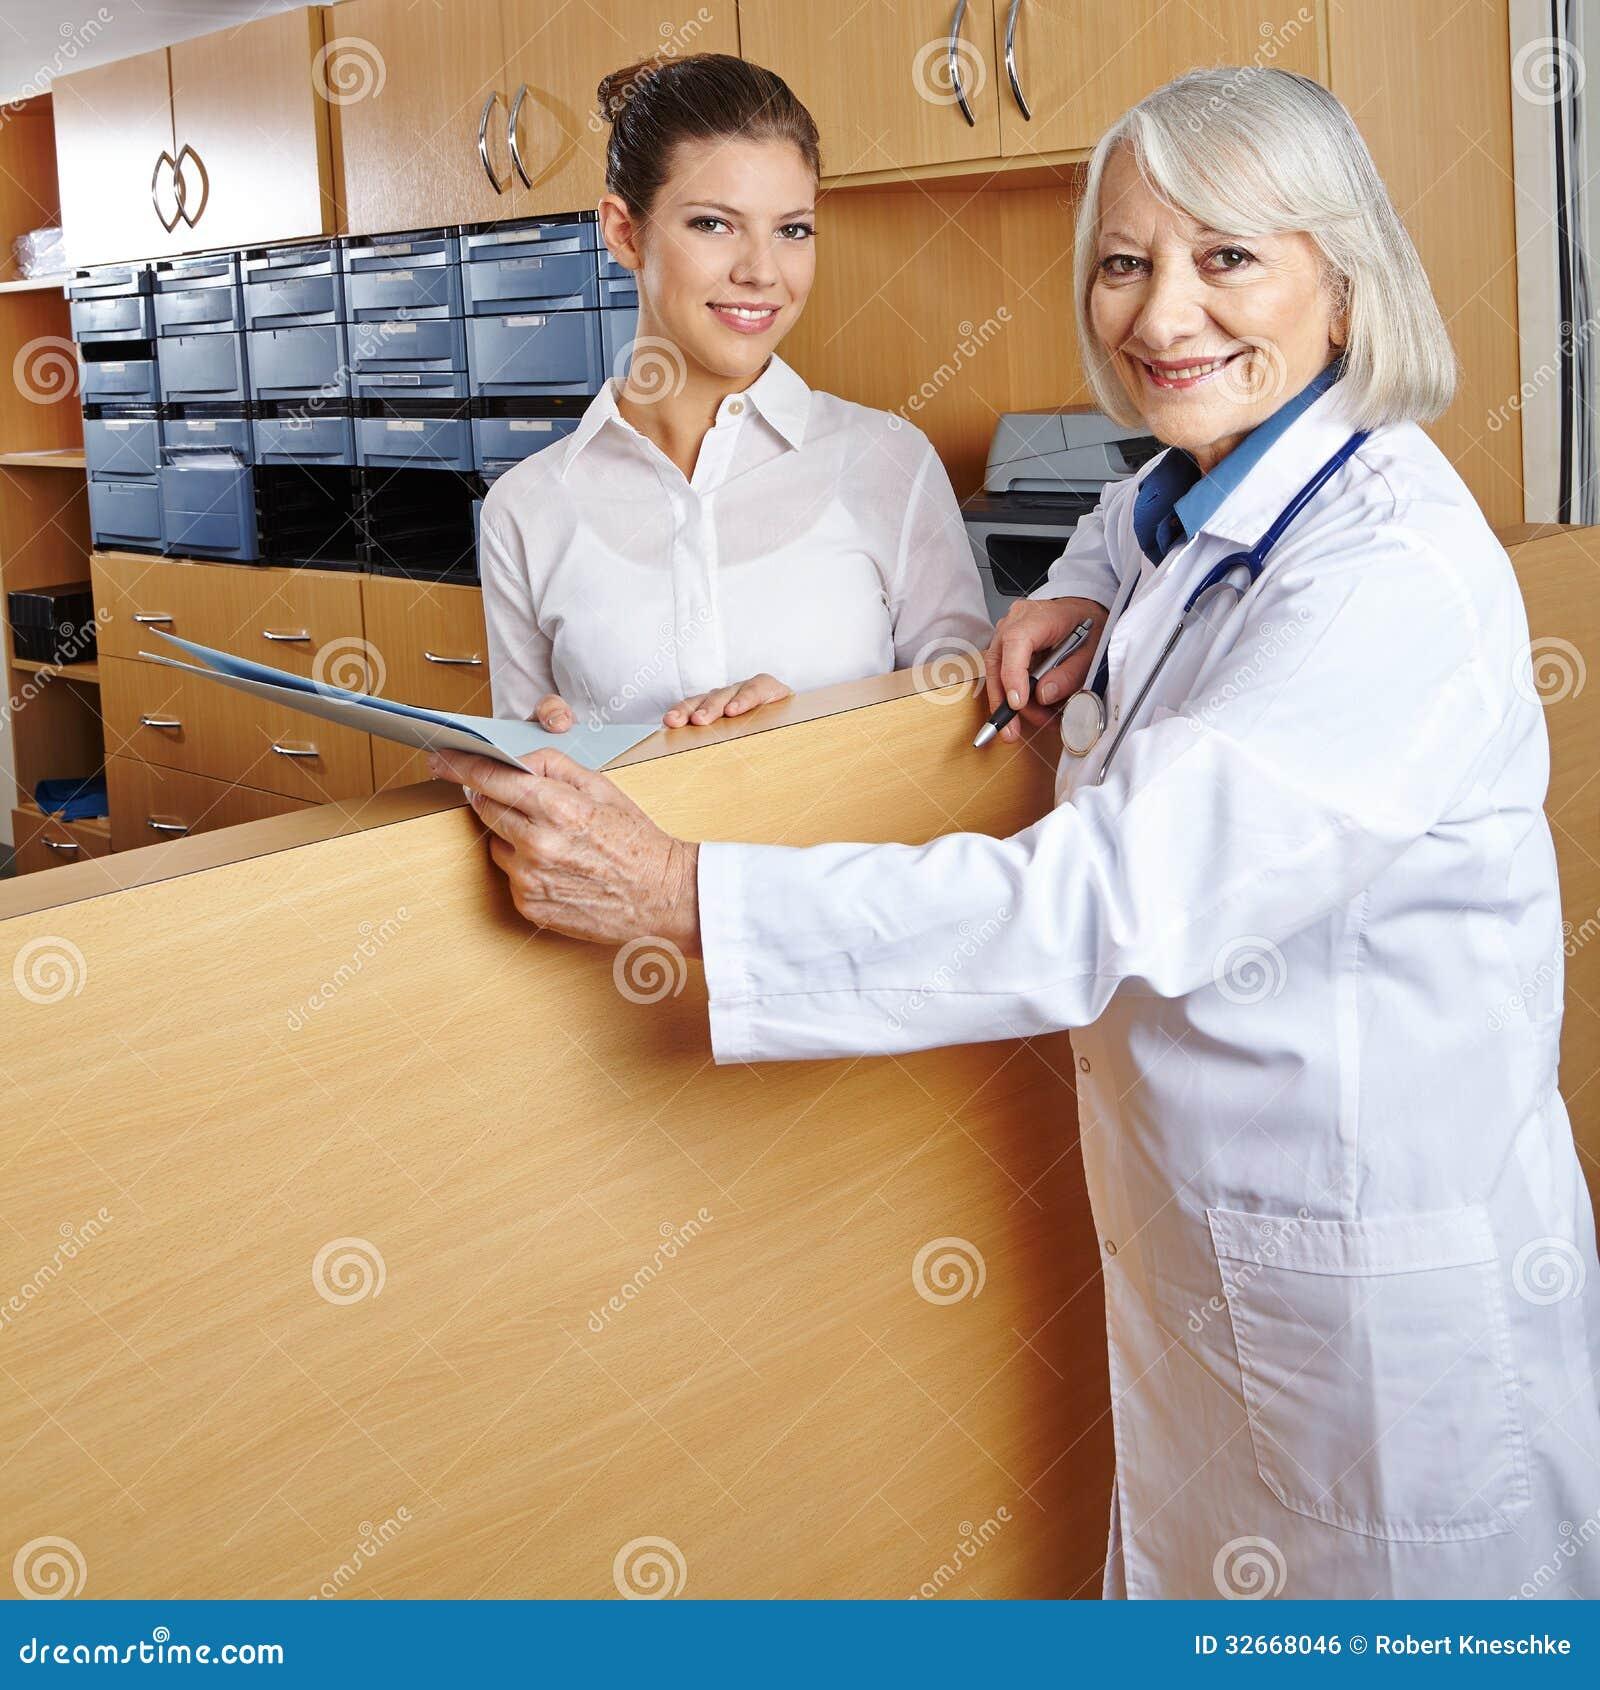 Receptionist  Hospital BiographyHospital Receptionist